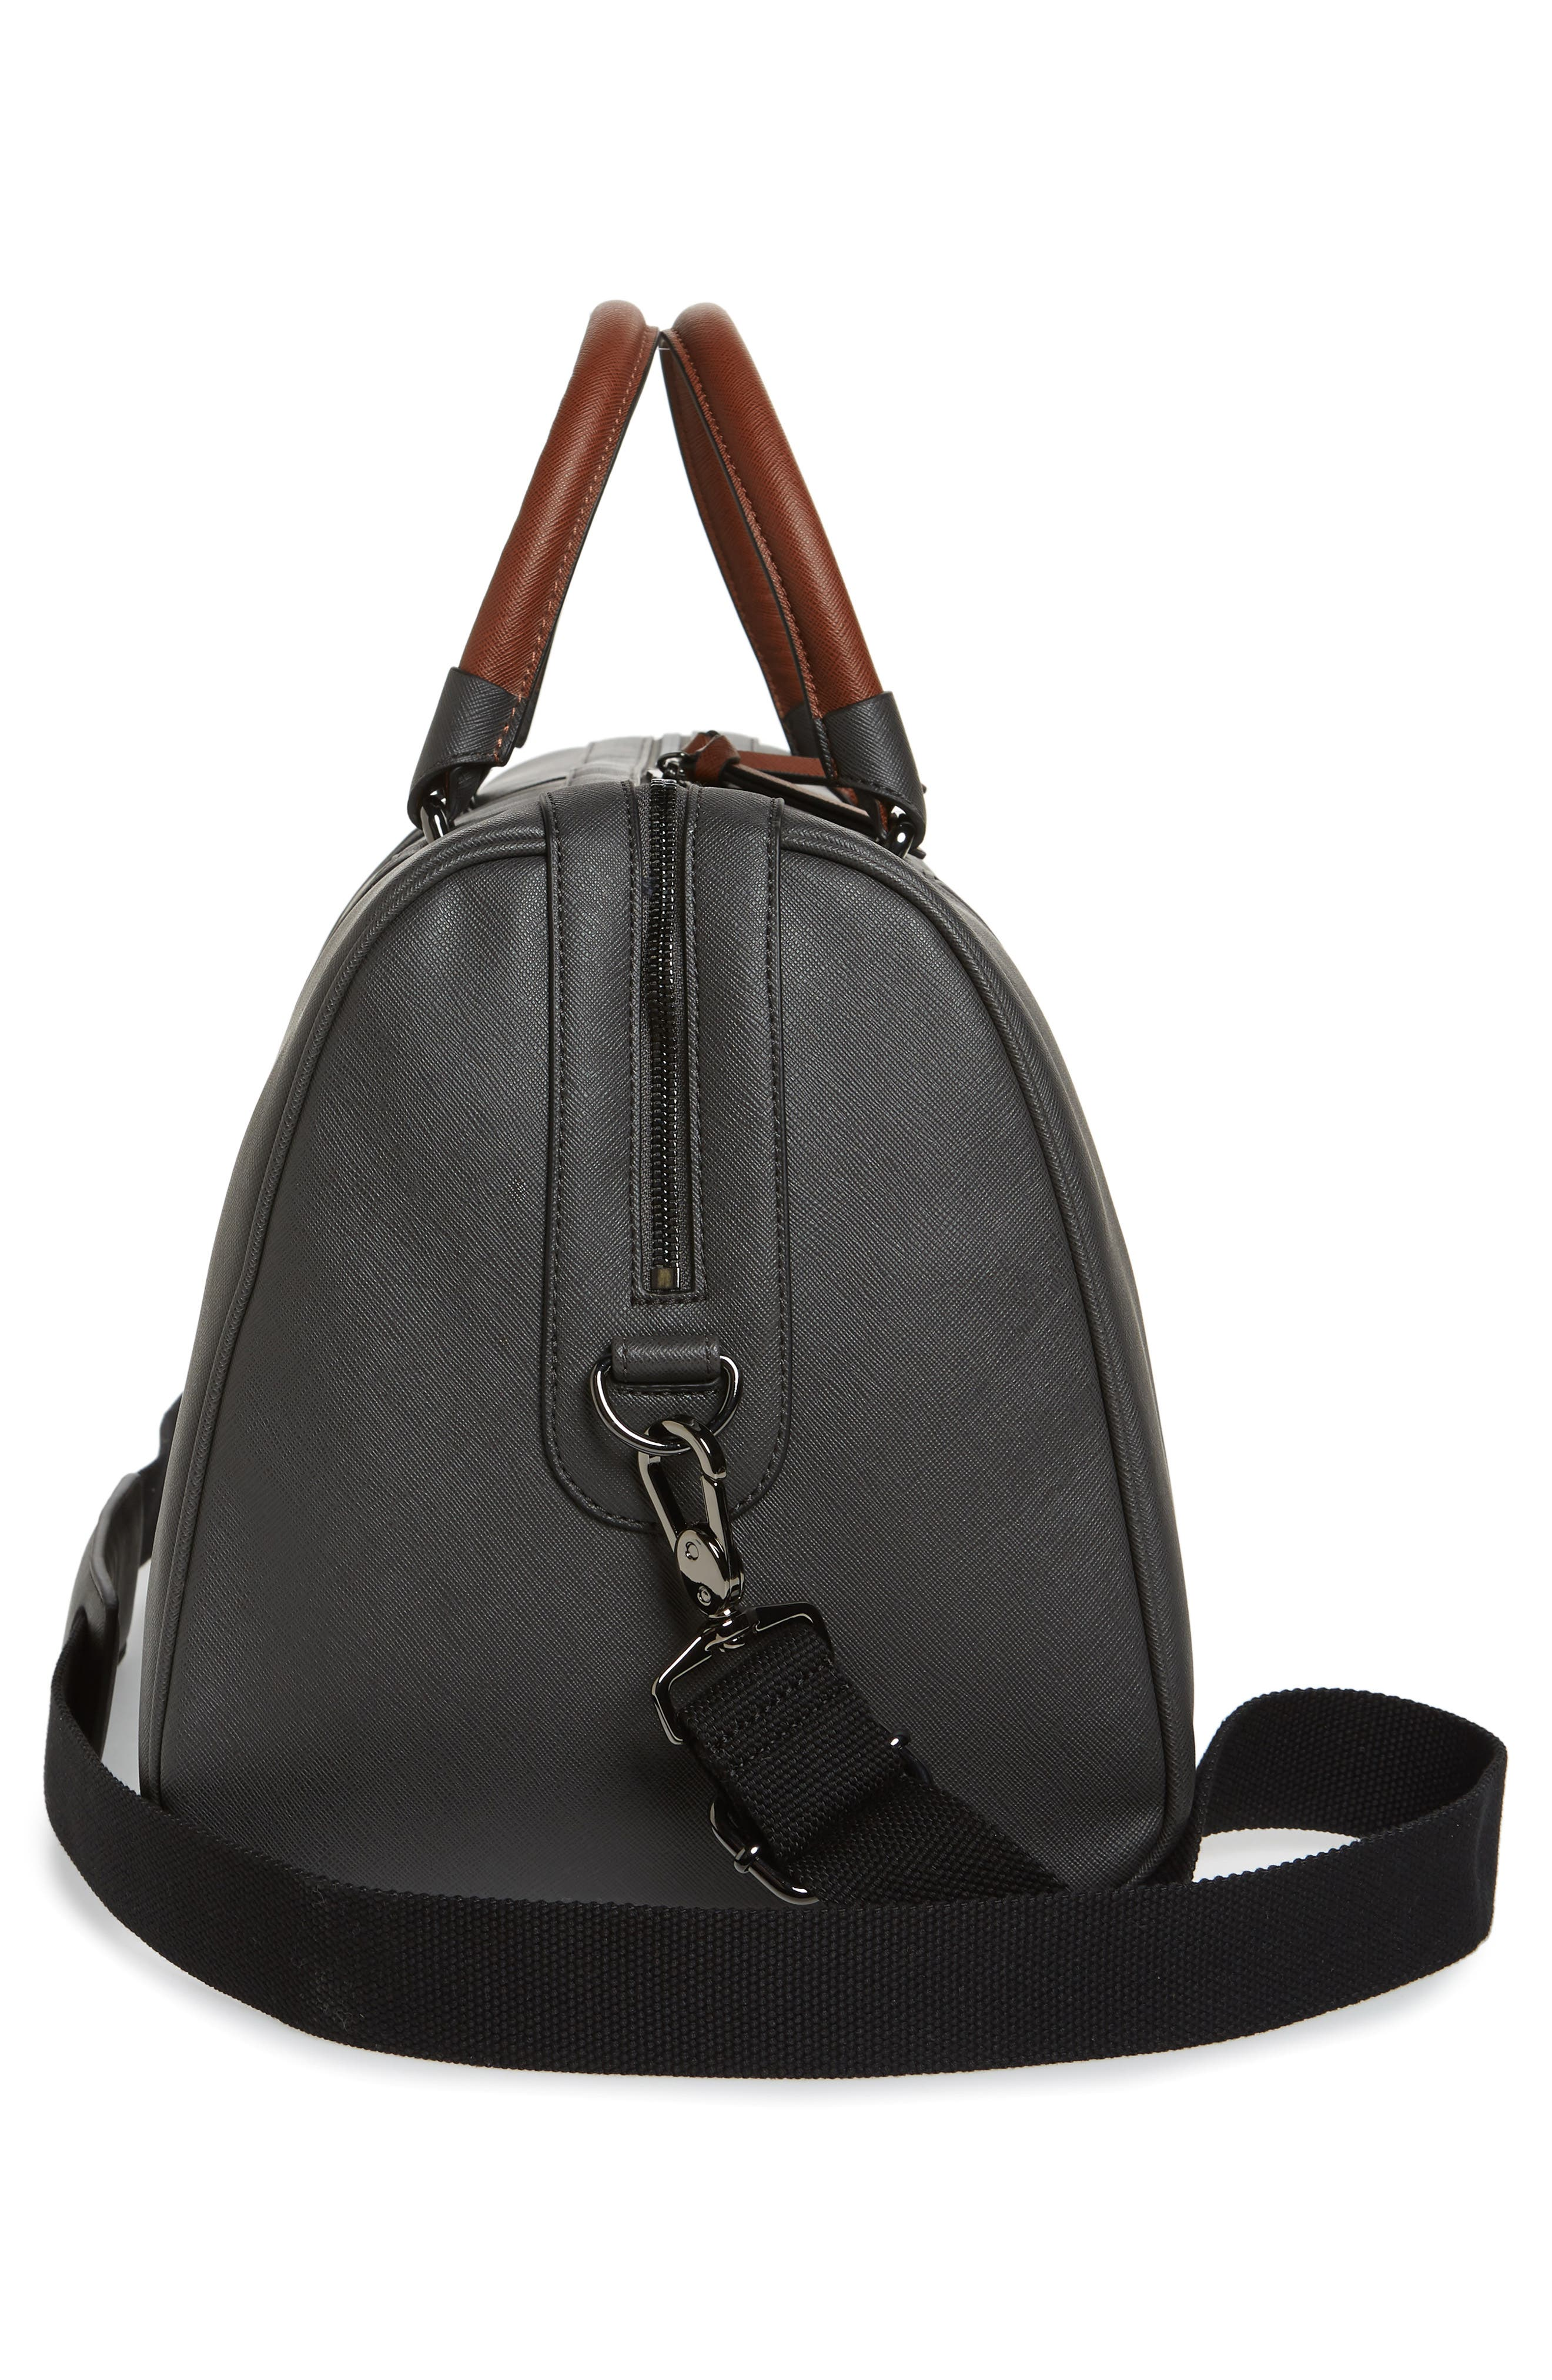 TED BAKER LONDON, Grankan Faux Leather Duffel Bag, Alternate thumbnail 5, color, 020